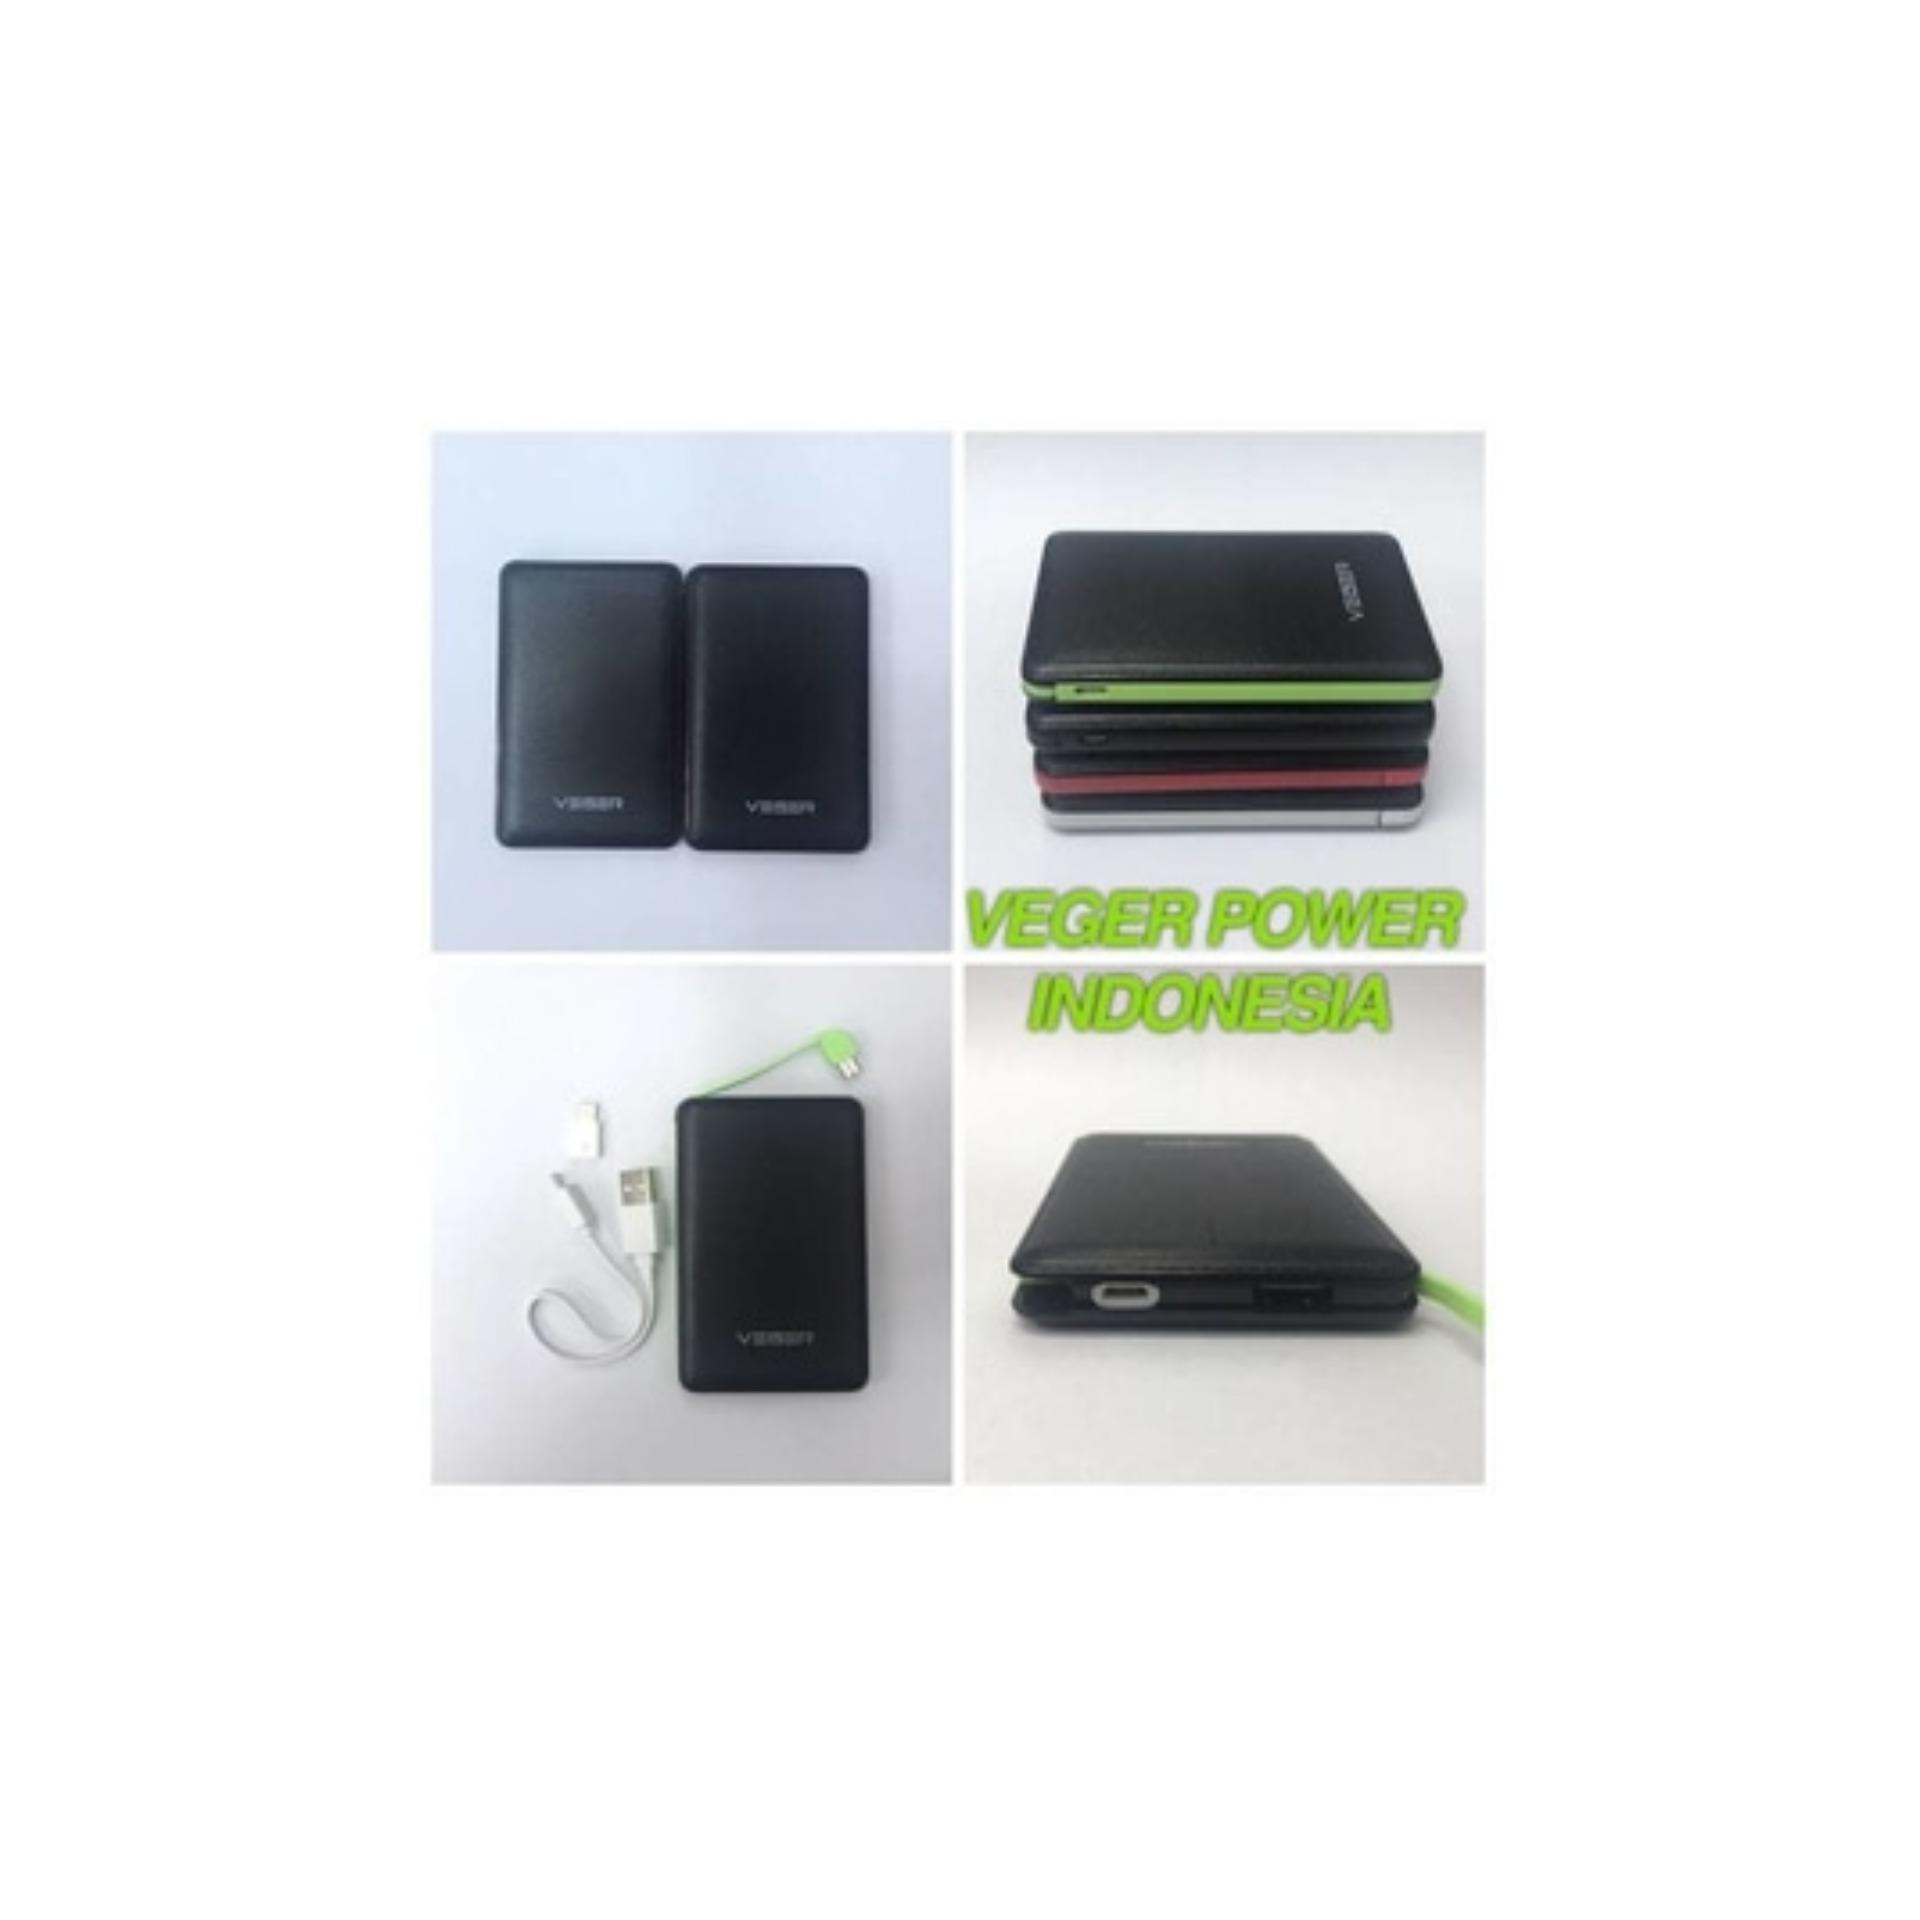 Veger V58 Power Bank Slim 12800mAh - List Hijau